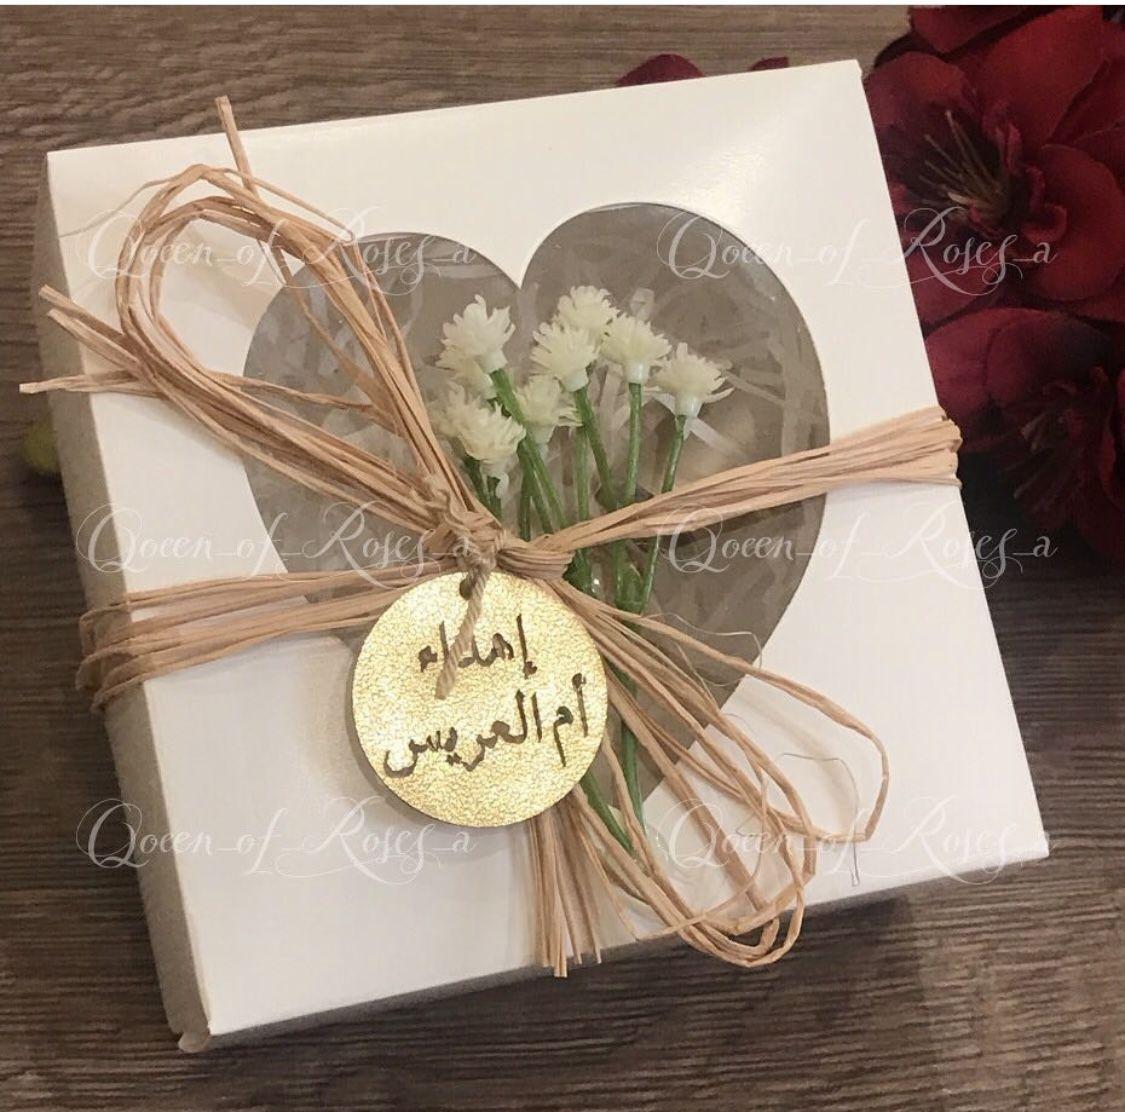 توزيعات Gift Wrapping Gifts Wrap